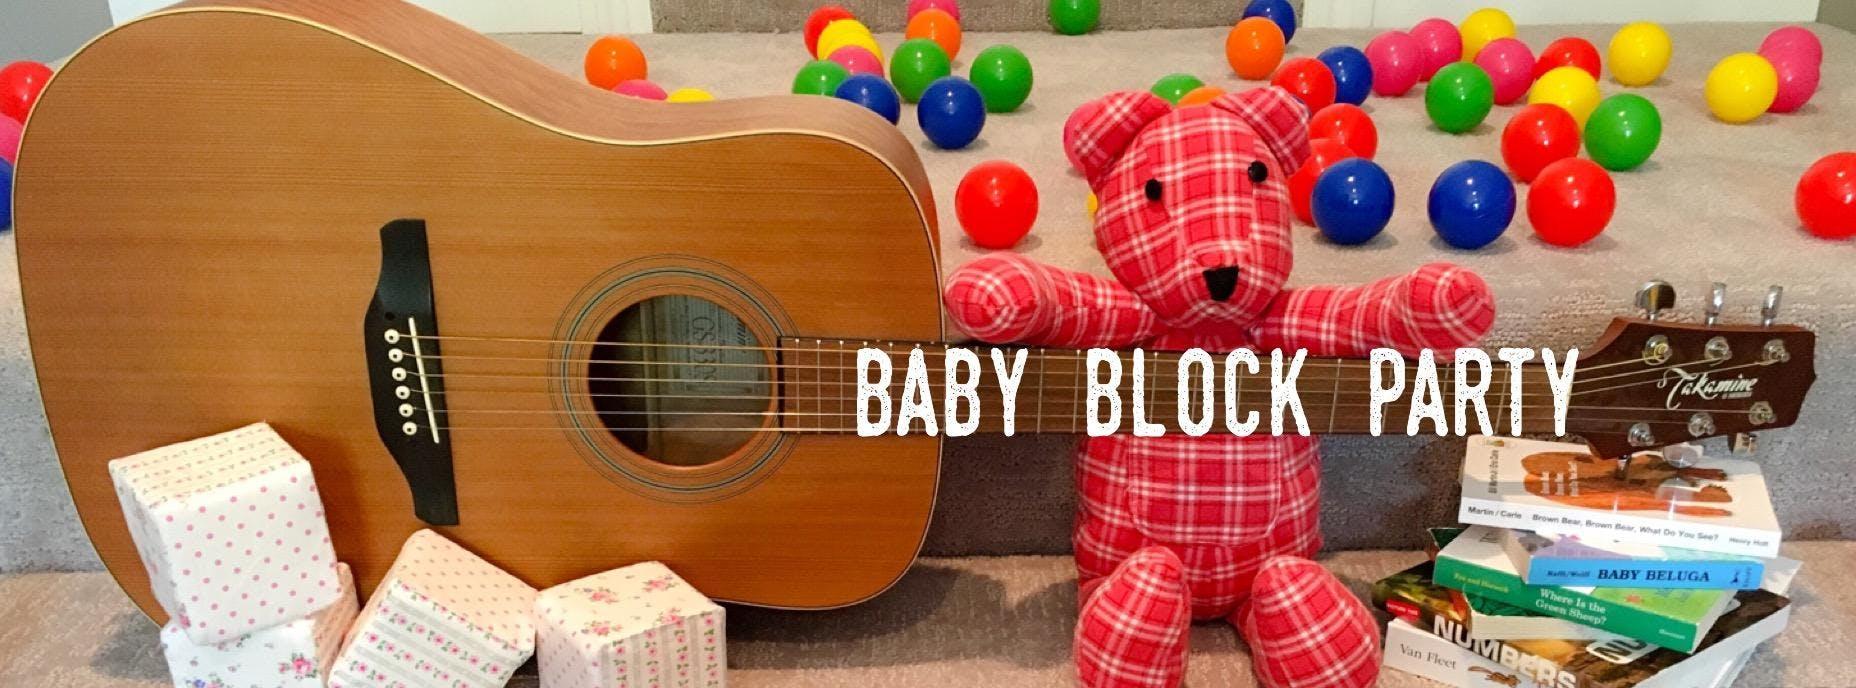 Baby Block Party